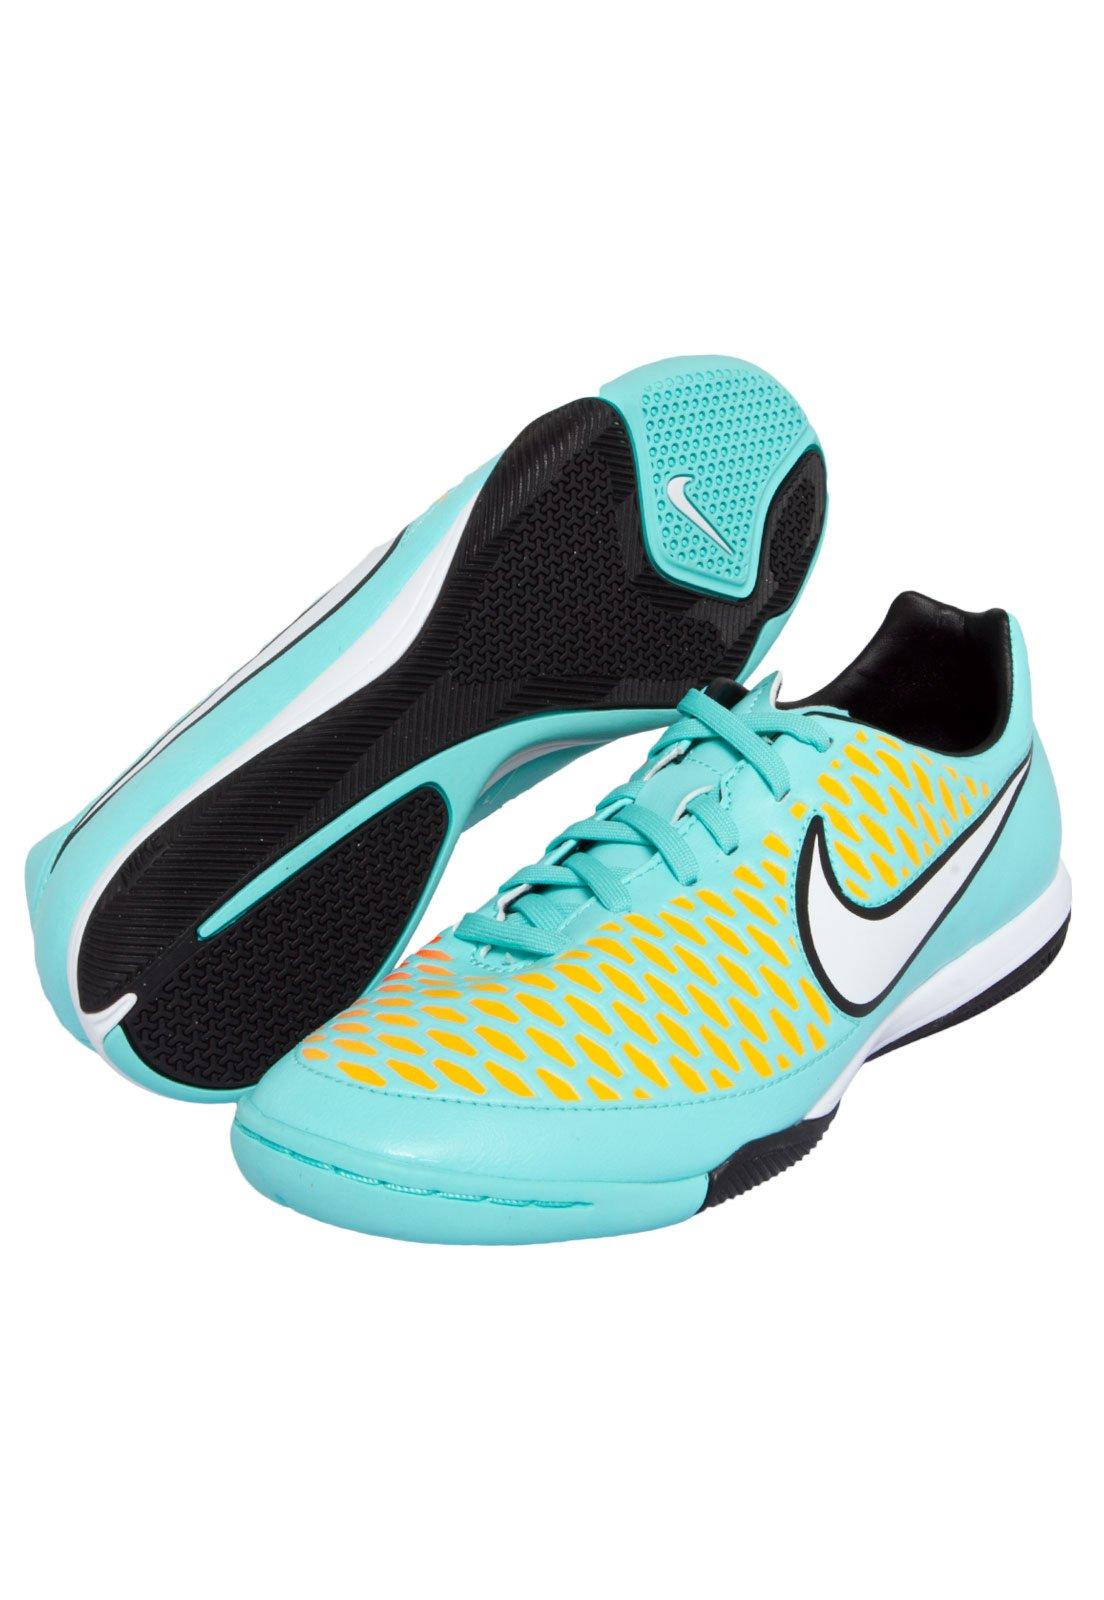 Halar De nada rural  Chuteira Nike Magista Onda IC Verde - Compre Agora | Dafiti Sports Brasil